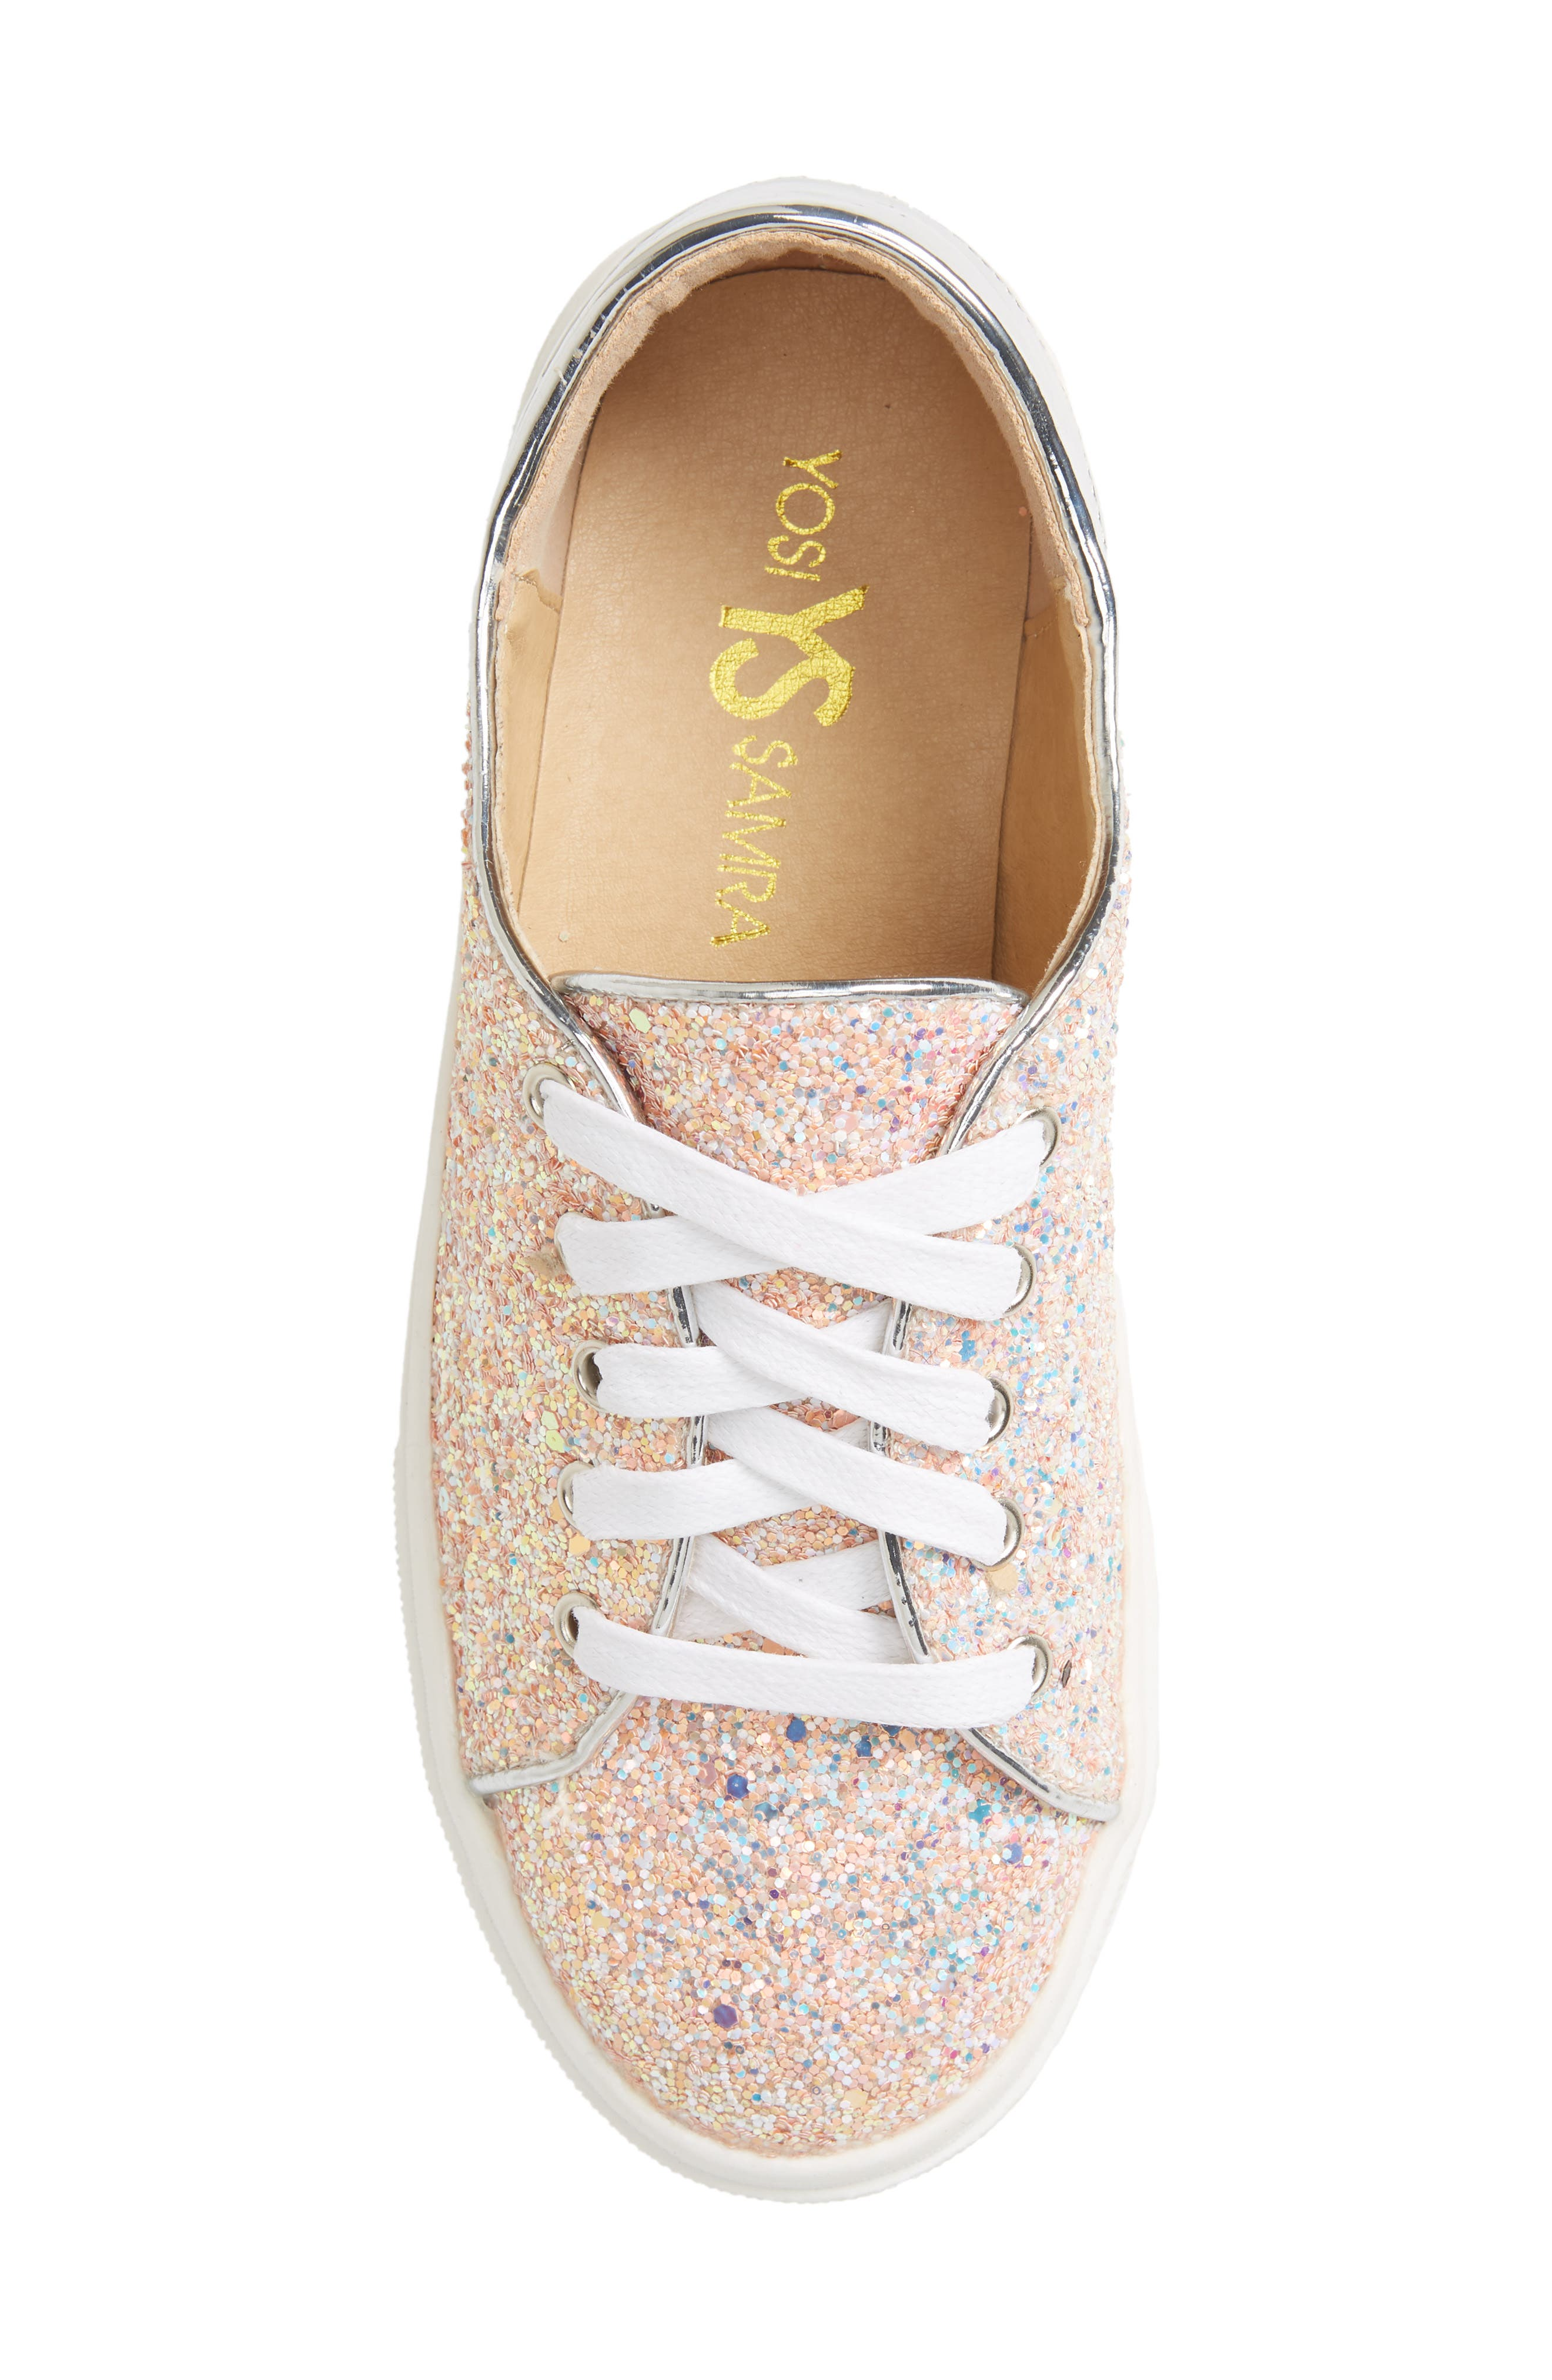 YOSI SAMRA,                             Miss Bowery Glitter Sneaker,                             Alternate thumbnail 5, color,                             182